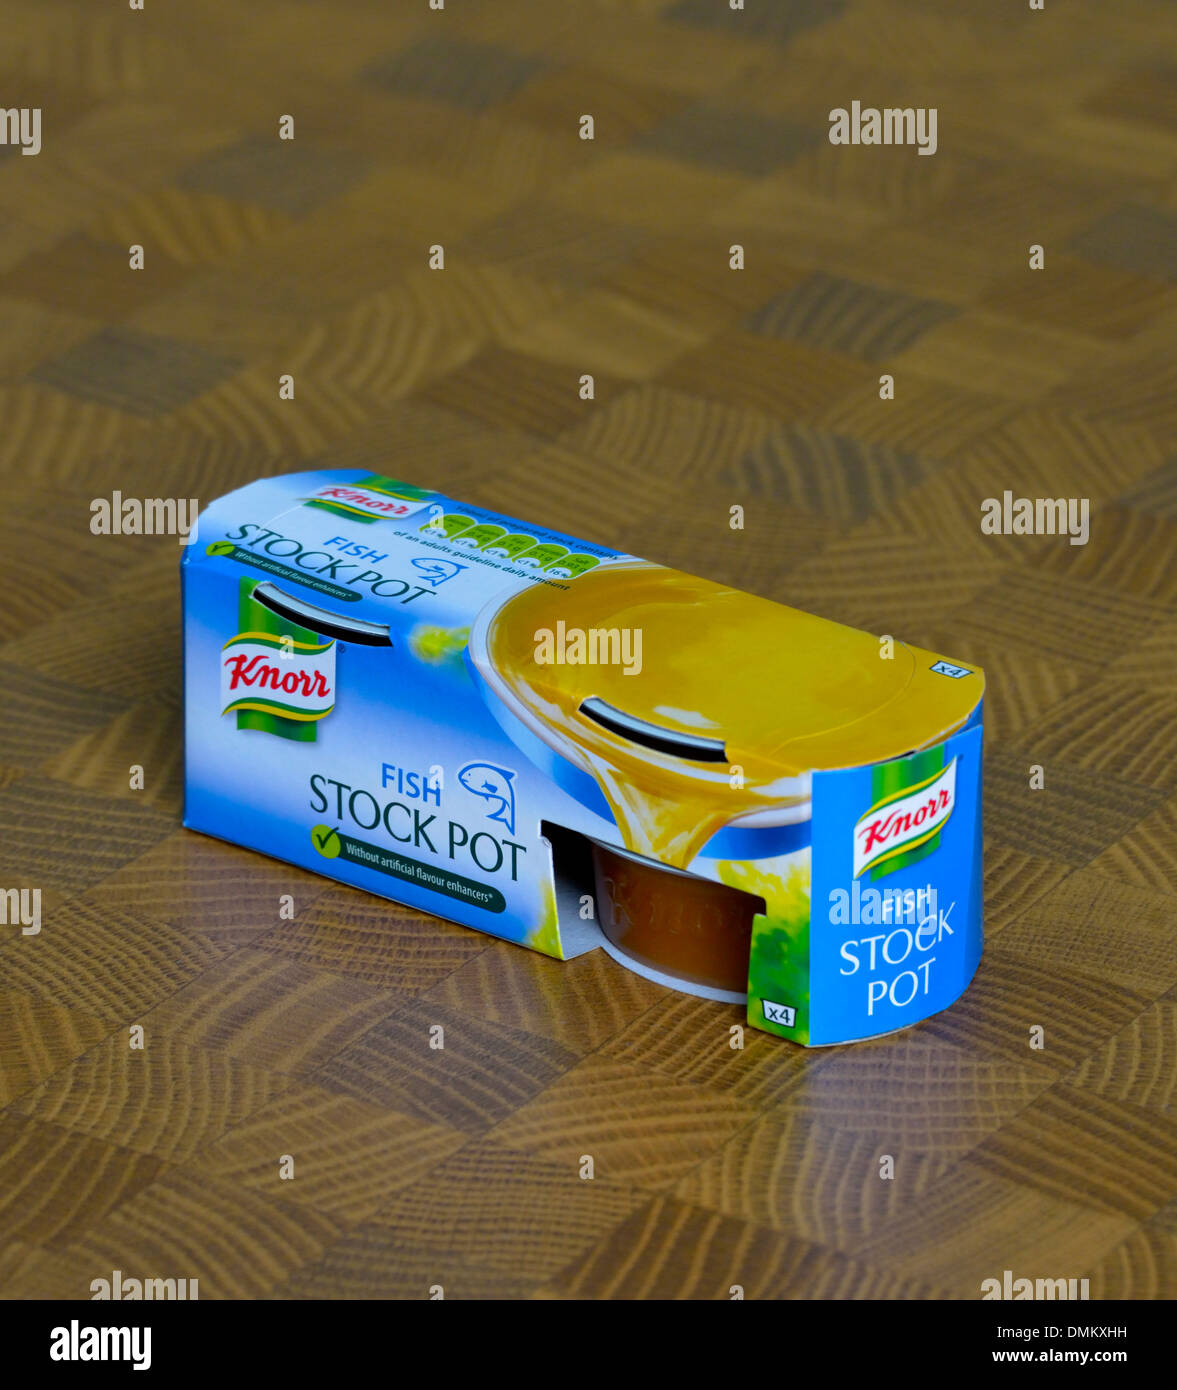 box-of-knorr-fish-stock-pot-DMKXHH.jpg